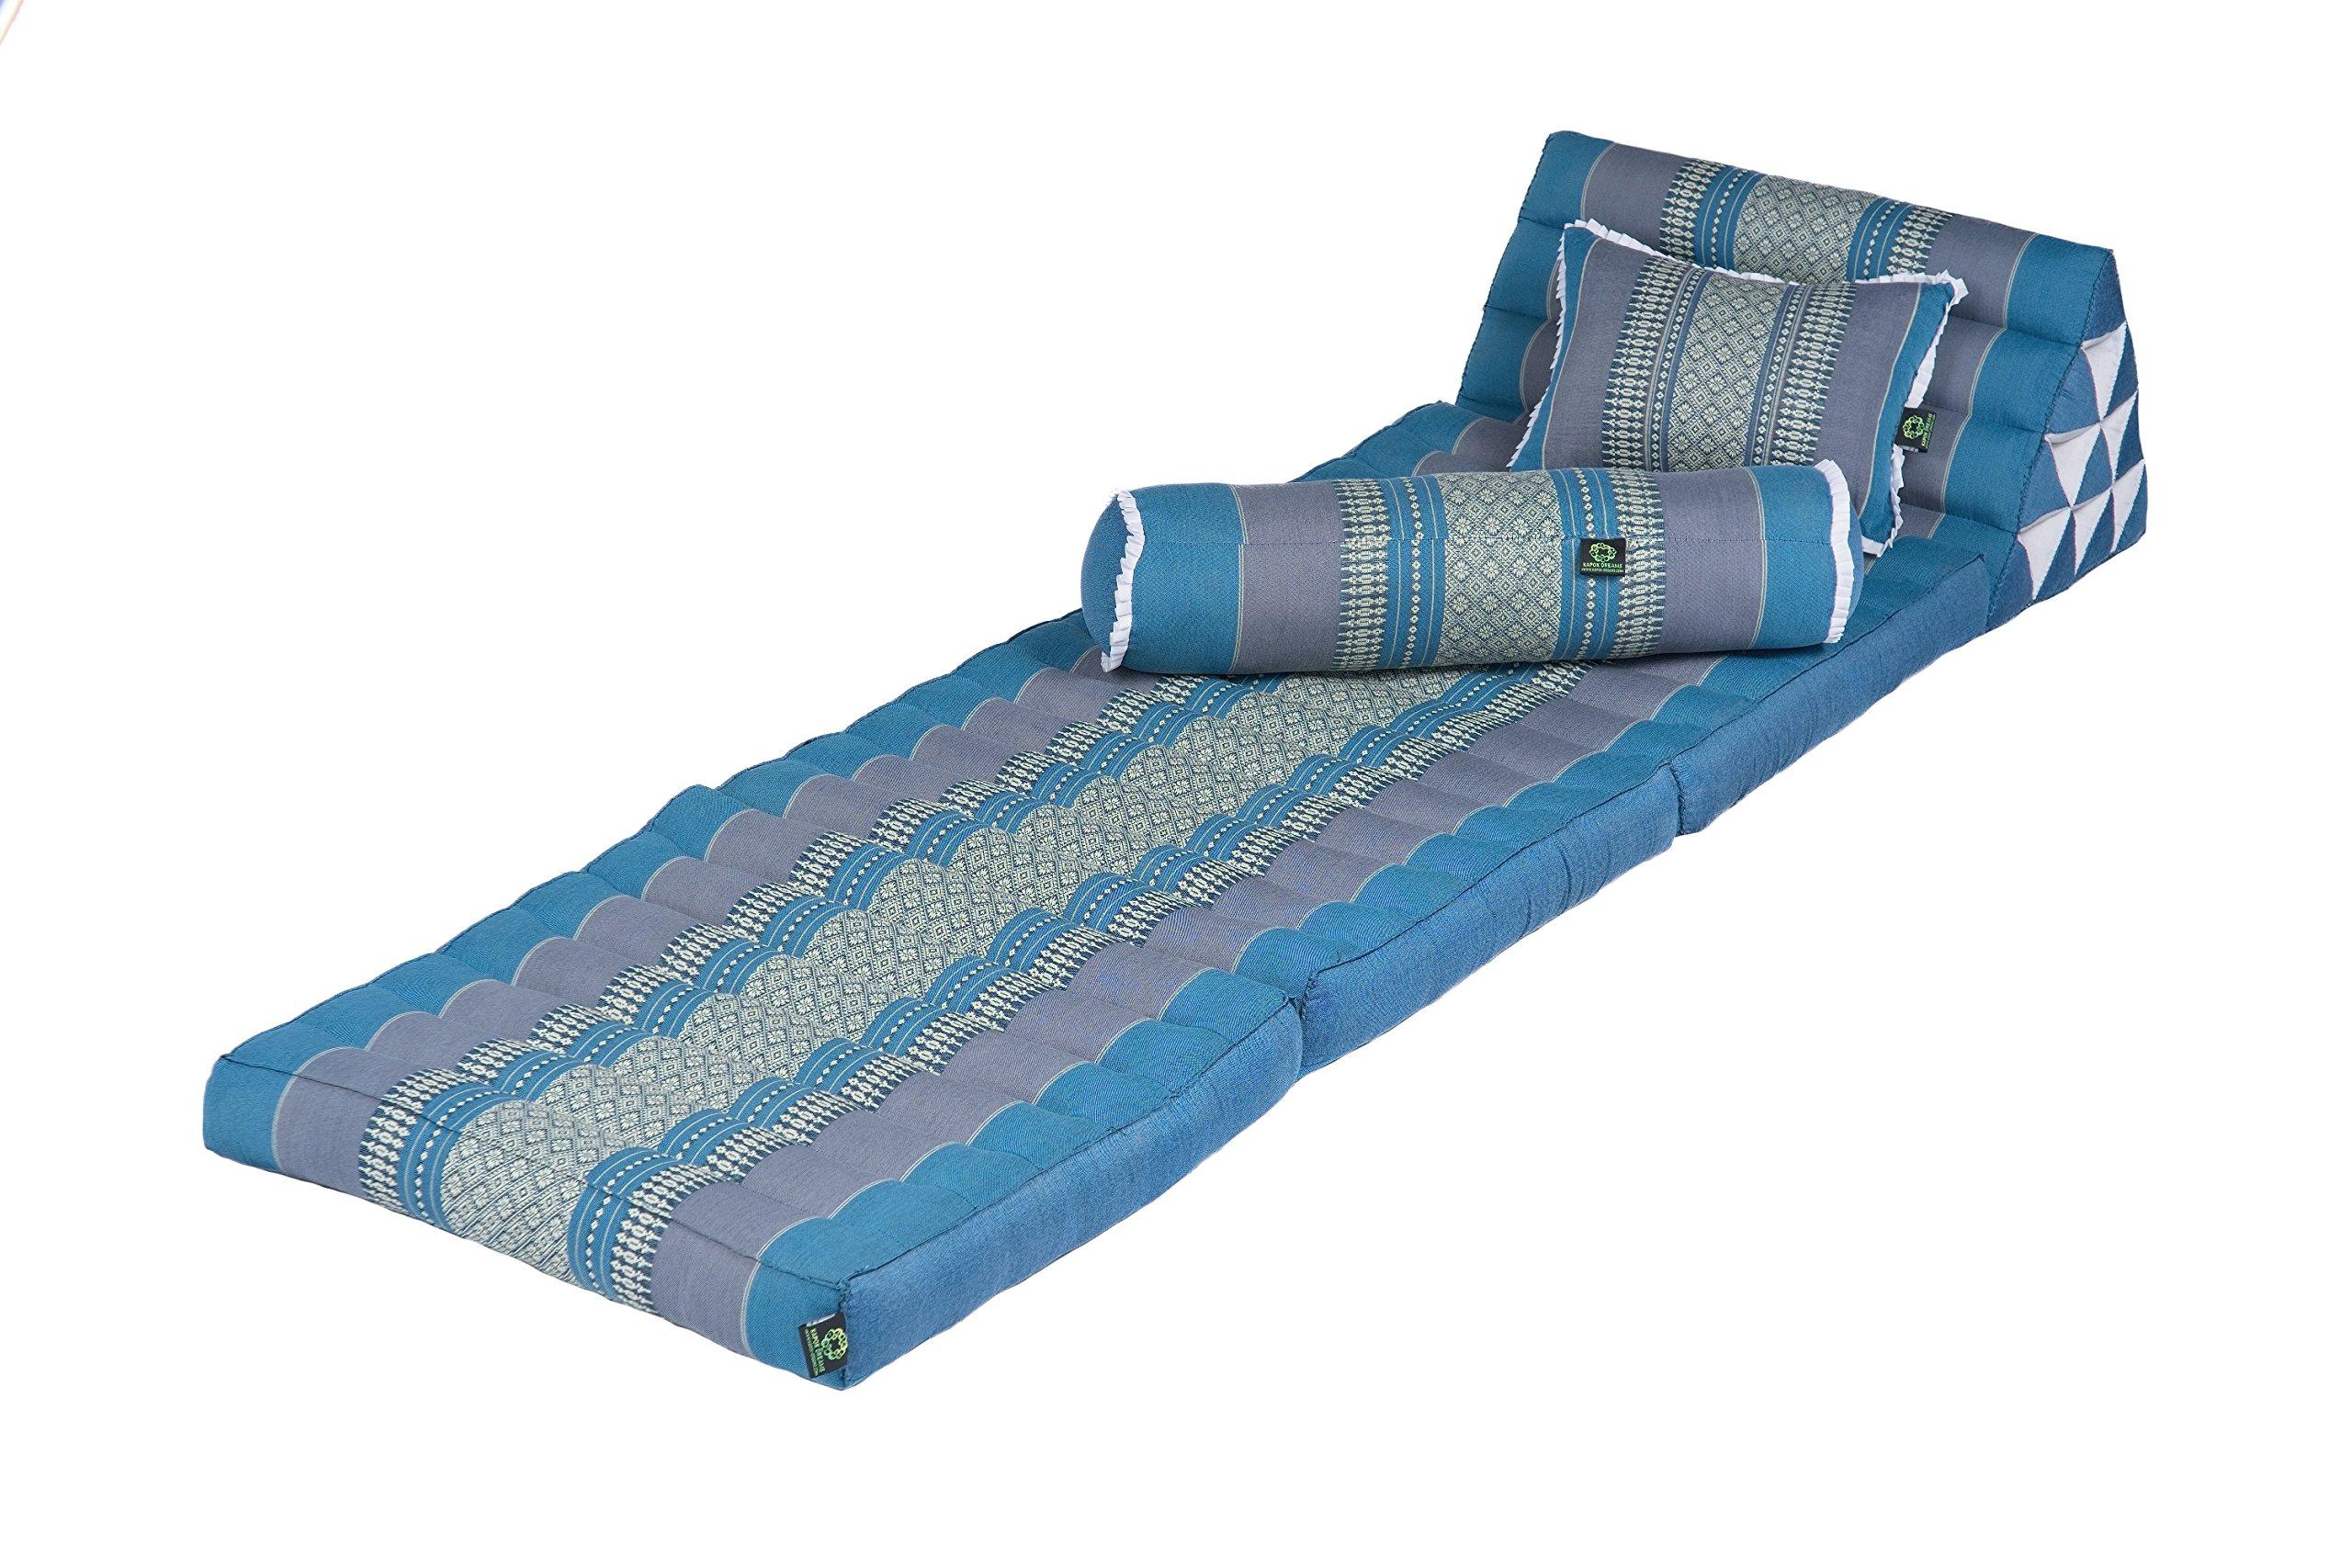 Kapok Dreams Triangle Set: 3-fold Mat + Pillow + Bolster, 100% Kapok-Stuffing, SkyBlues